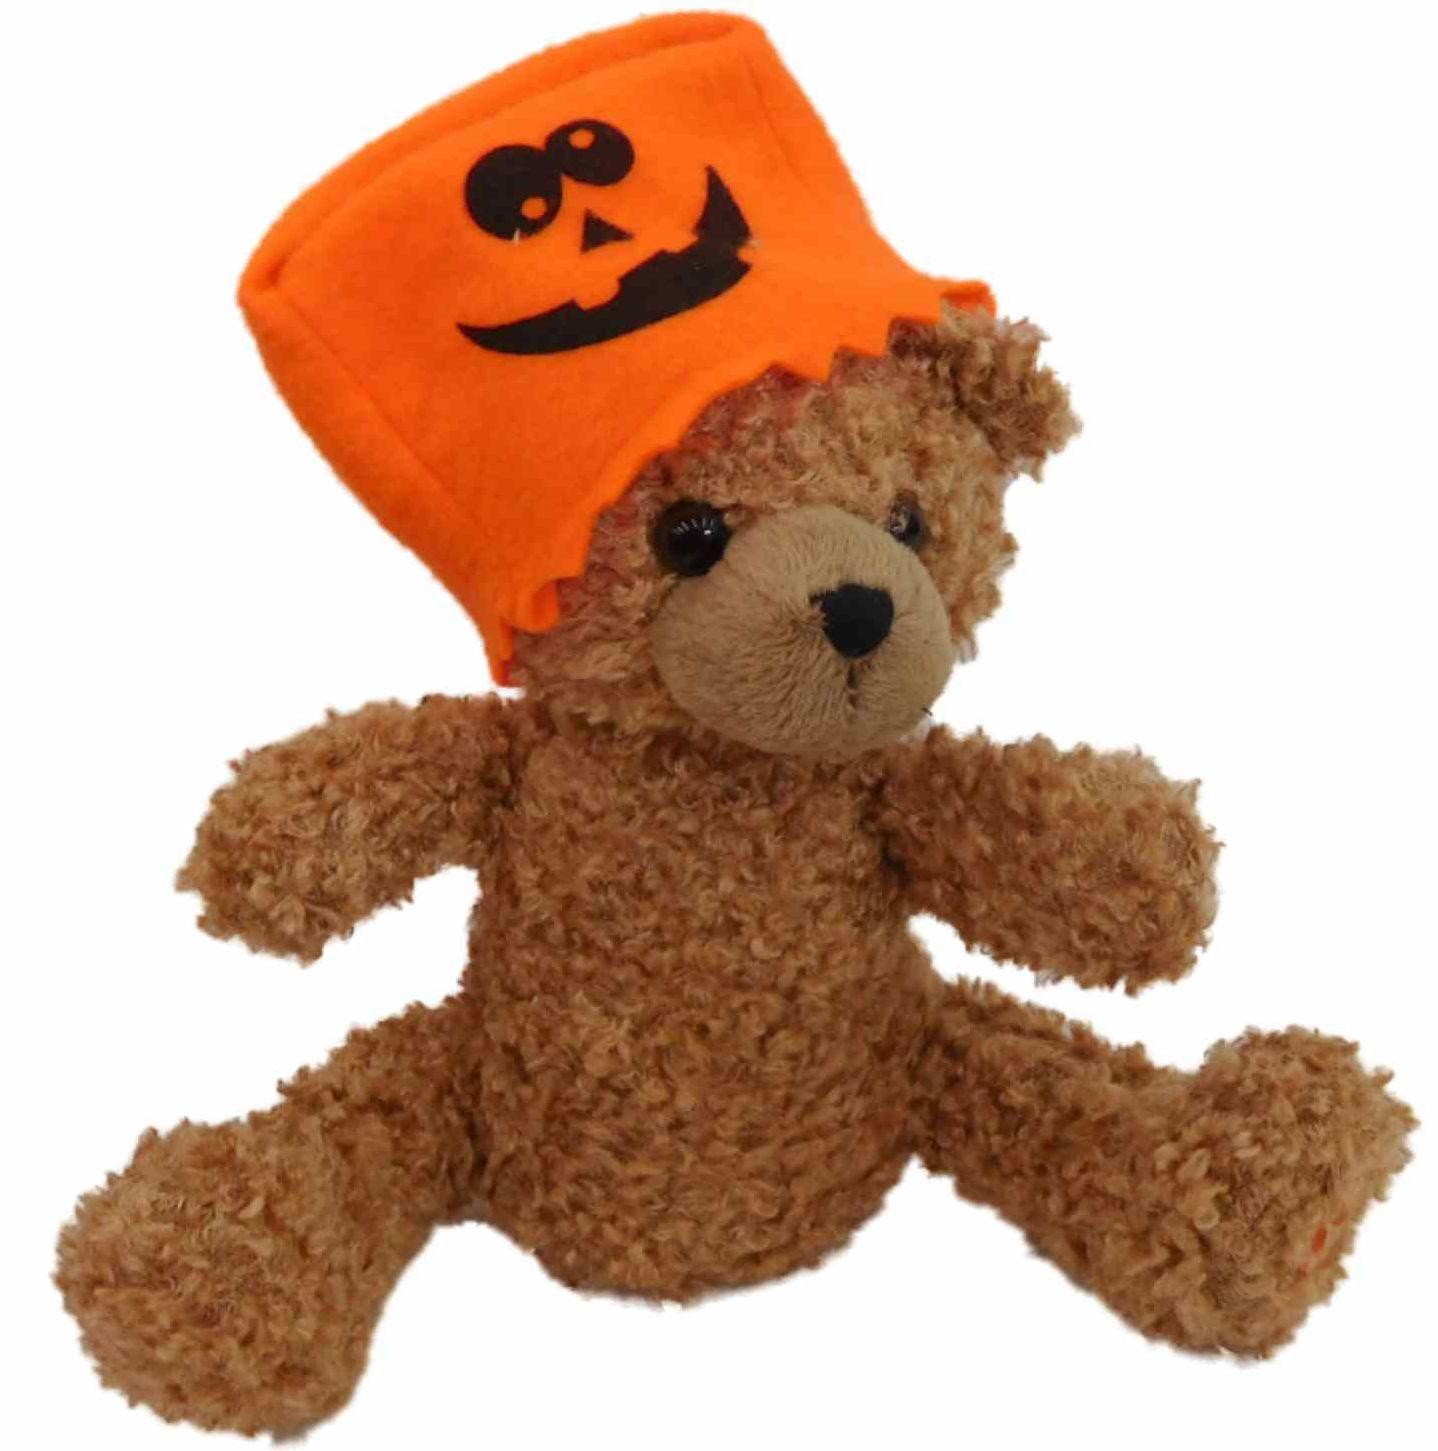 Candy Corn Shaking Spooky Halloween Teddy Bear Plush Pal Stuffed Animal by Candy Corn